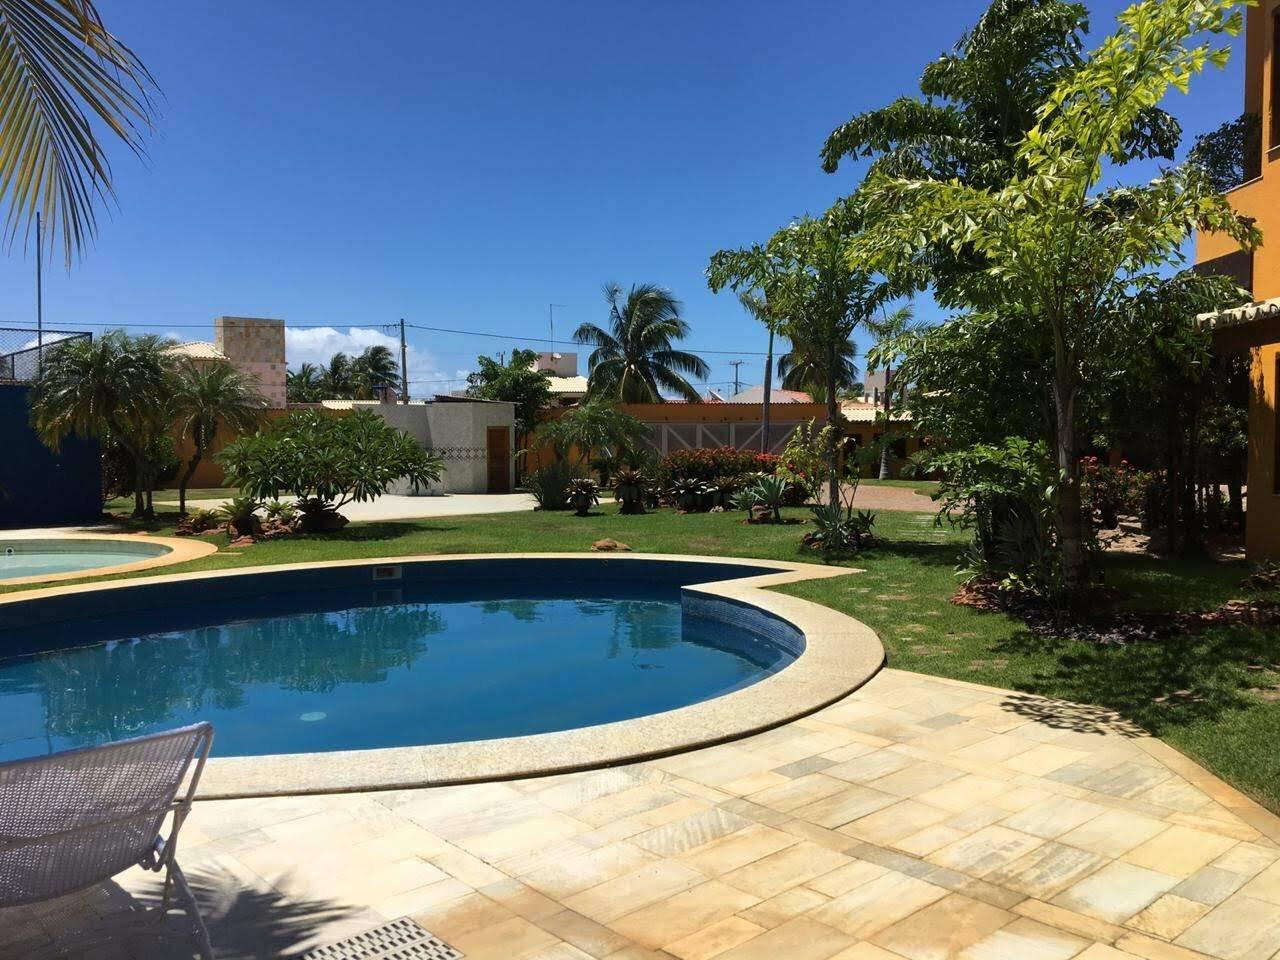 House in Camaçari, State of Bahia, Brazil 1 - 11371076